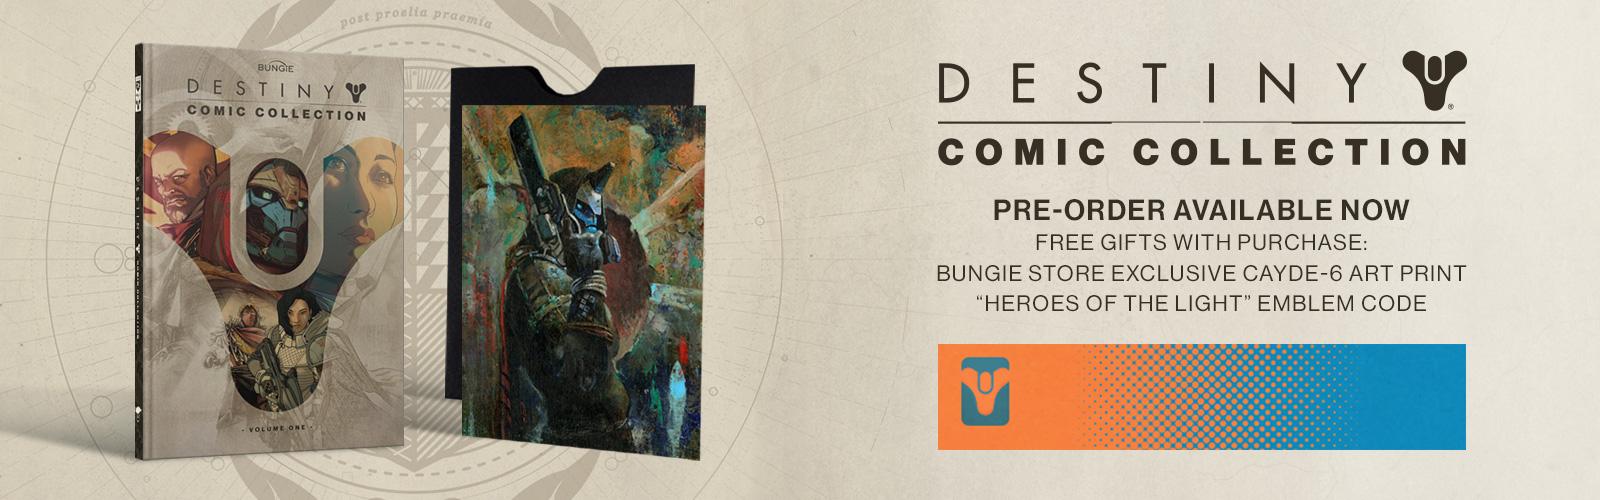 destiny_comic_collection_with_emblem.jpg?cv=3983621215&av=327229383